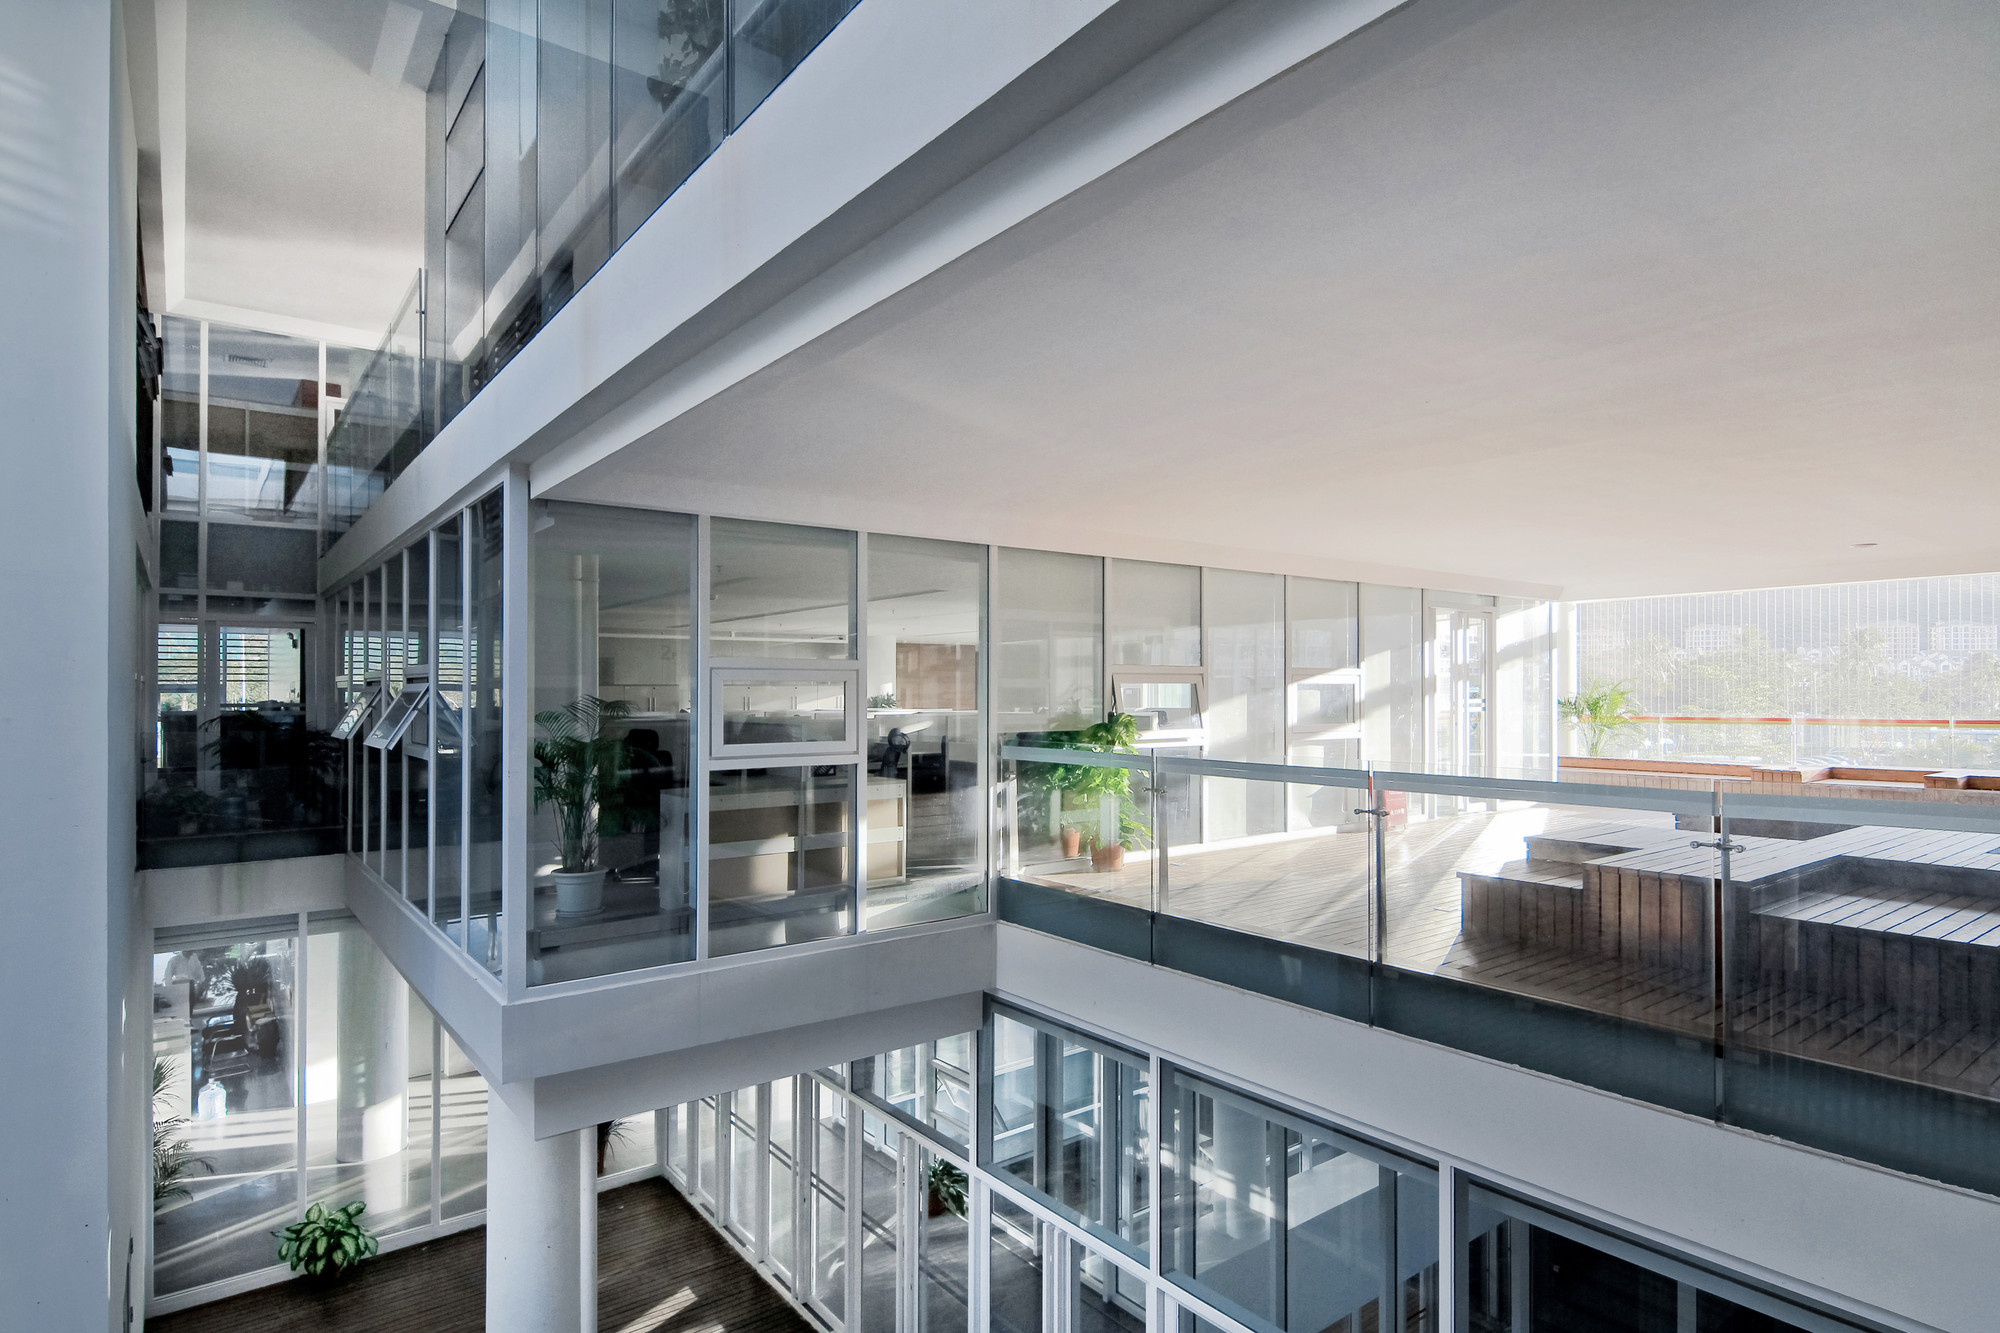 Yalong Bay Headquarters of COFCO / Zhubo Design Zstudio